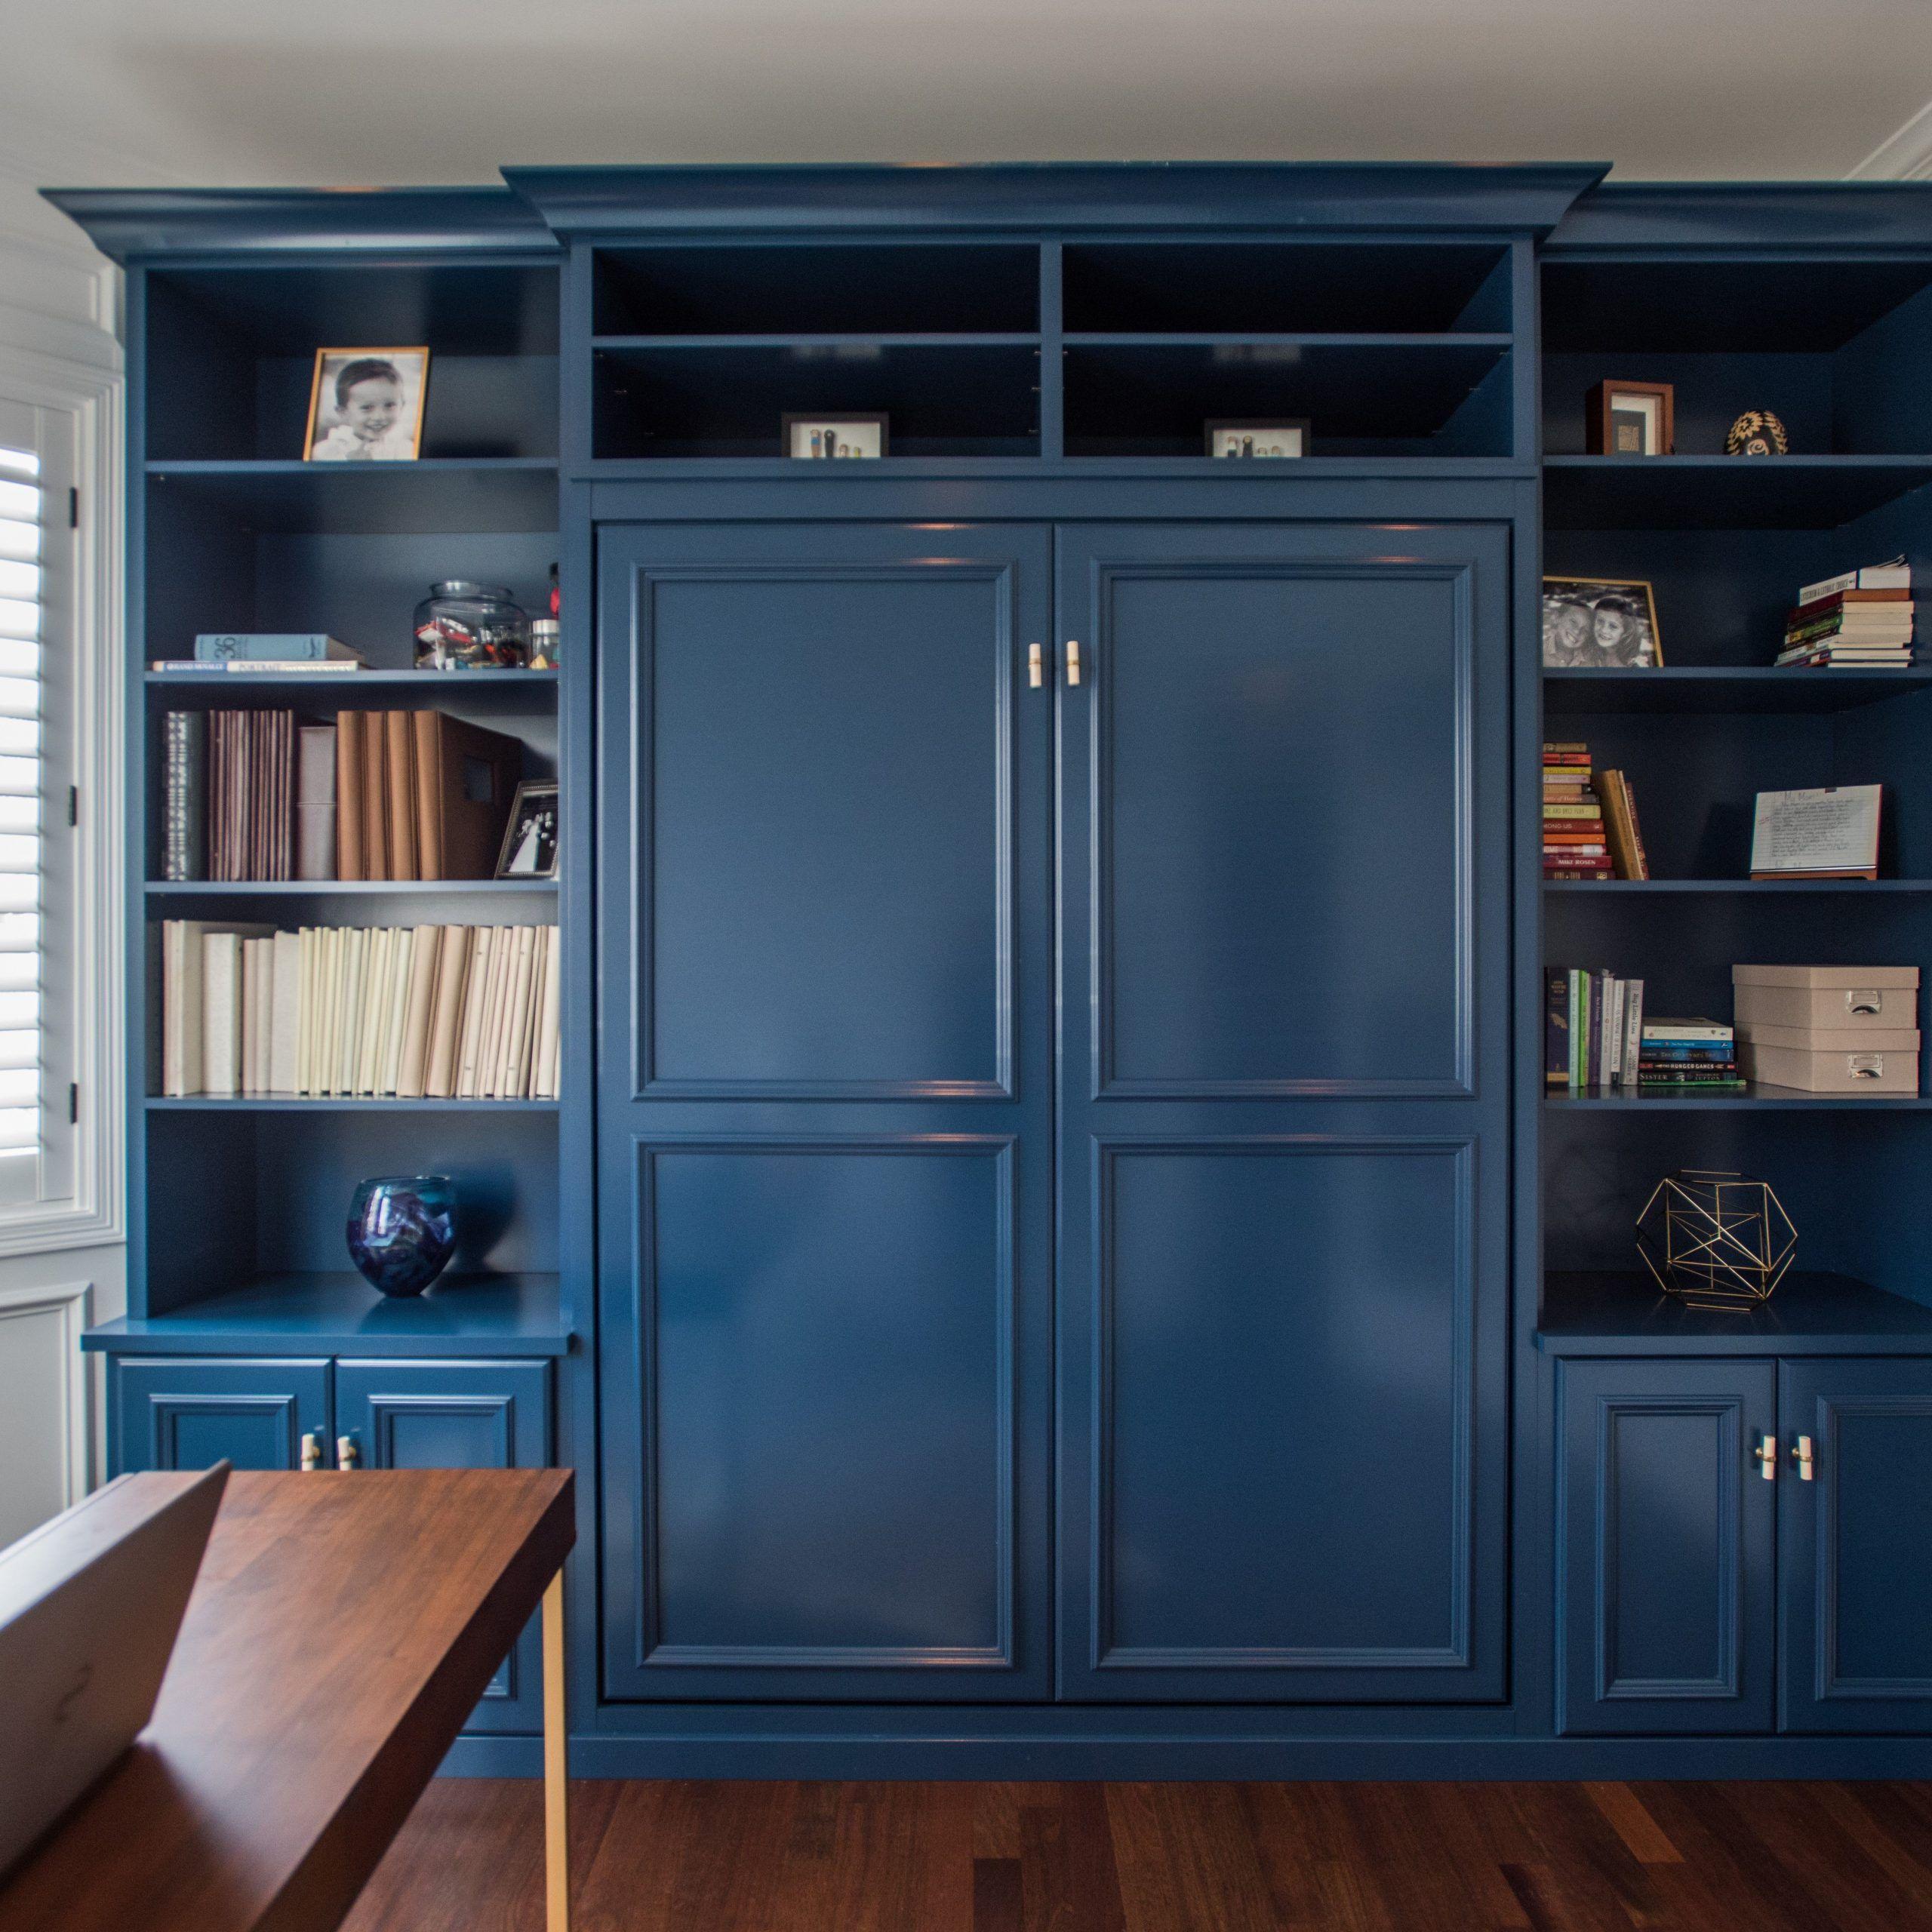 Denver Co Library With Custom Designed Book Shelf With Hidden